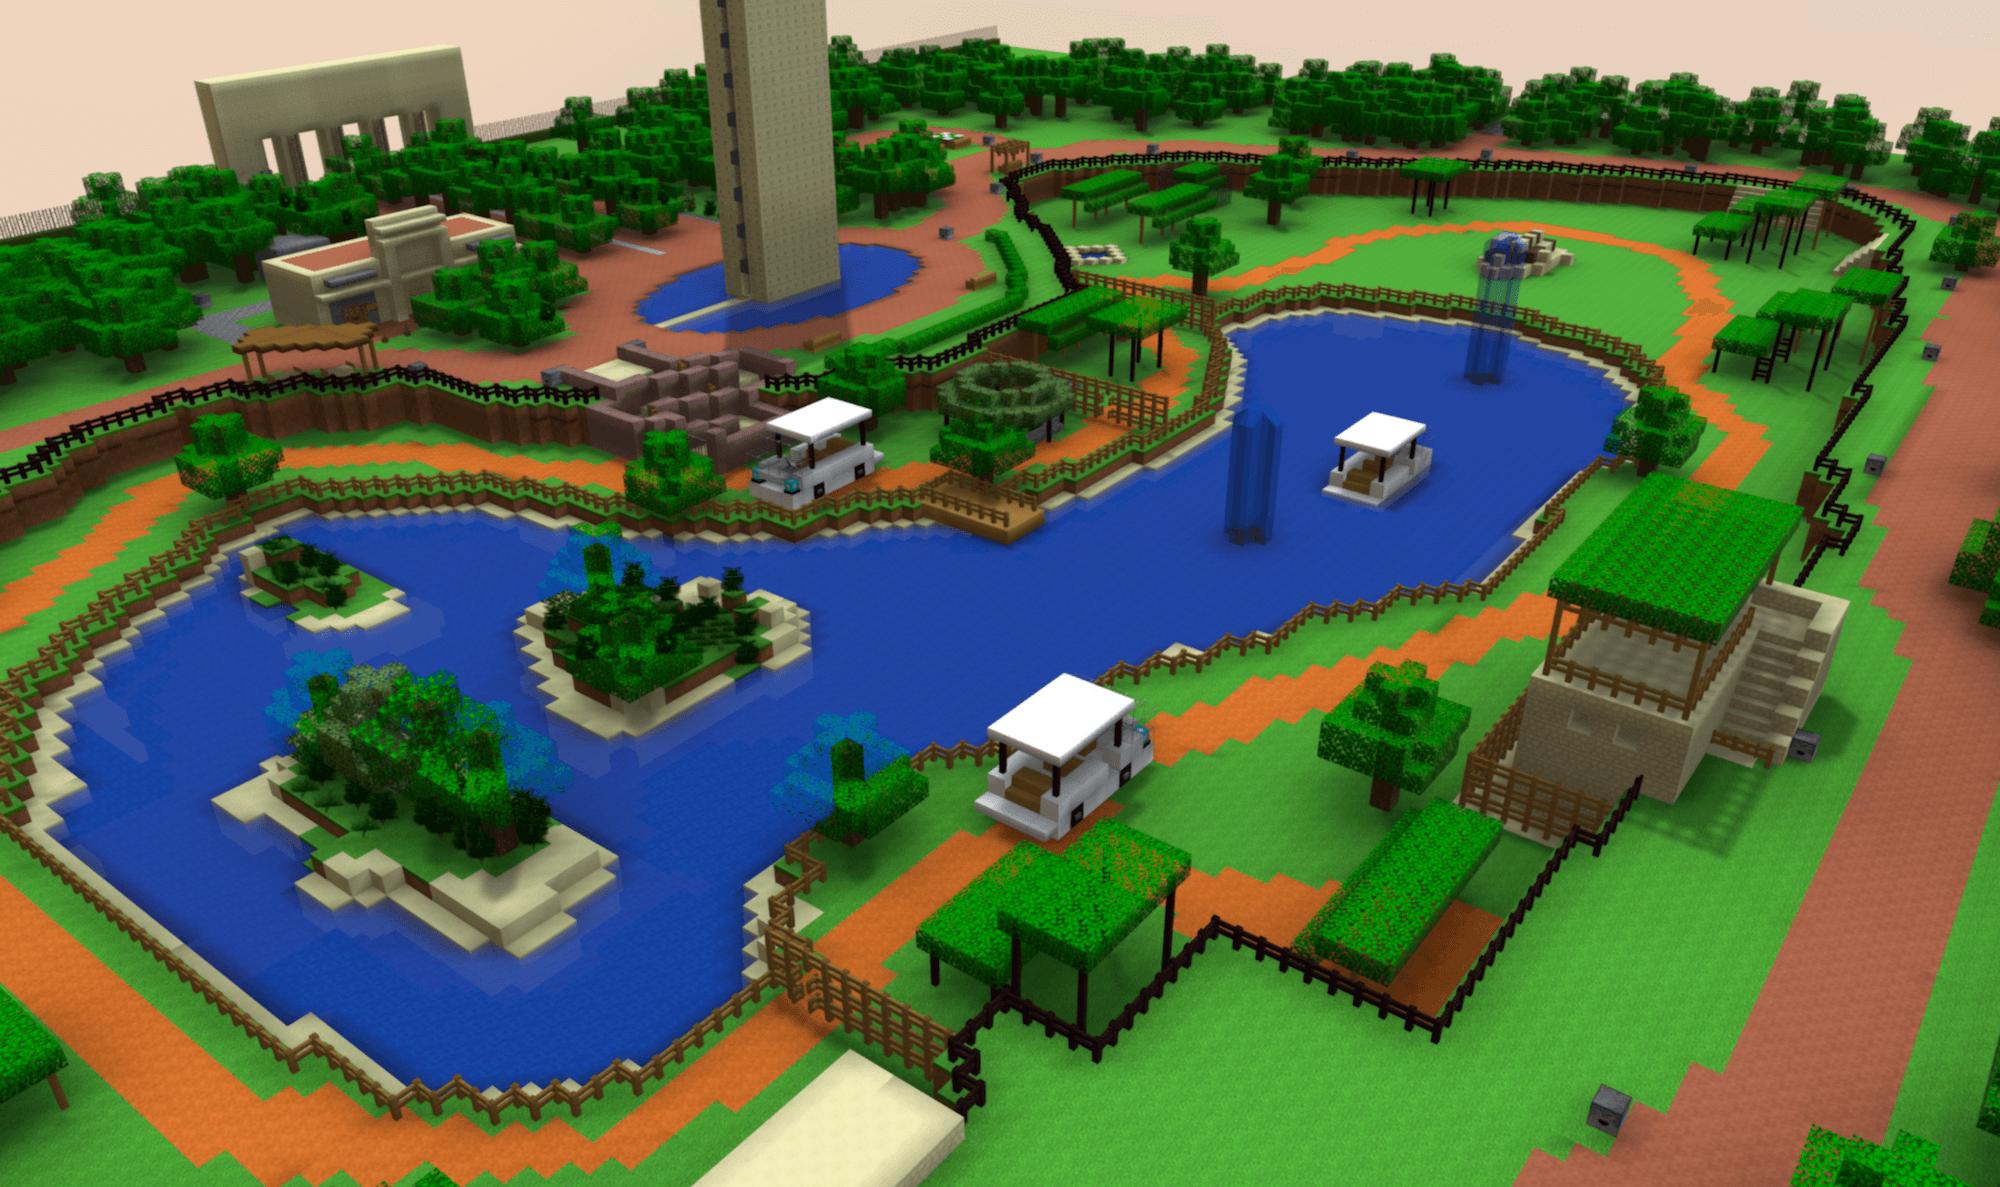 3D Minecraft Model of Parque Animaya, Merida